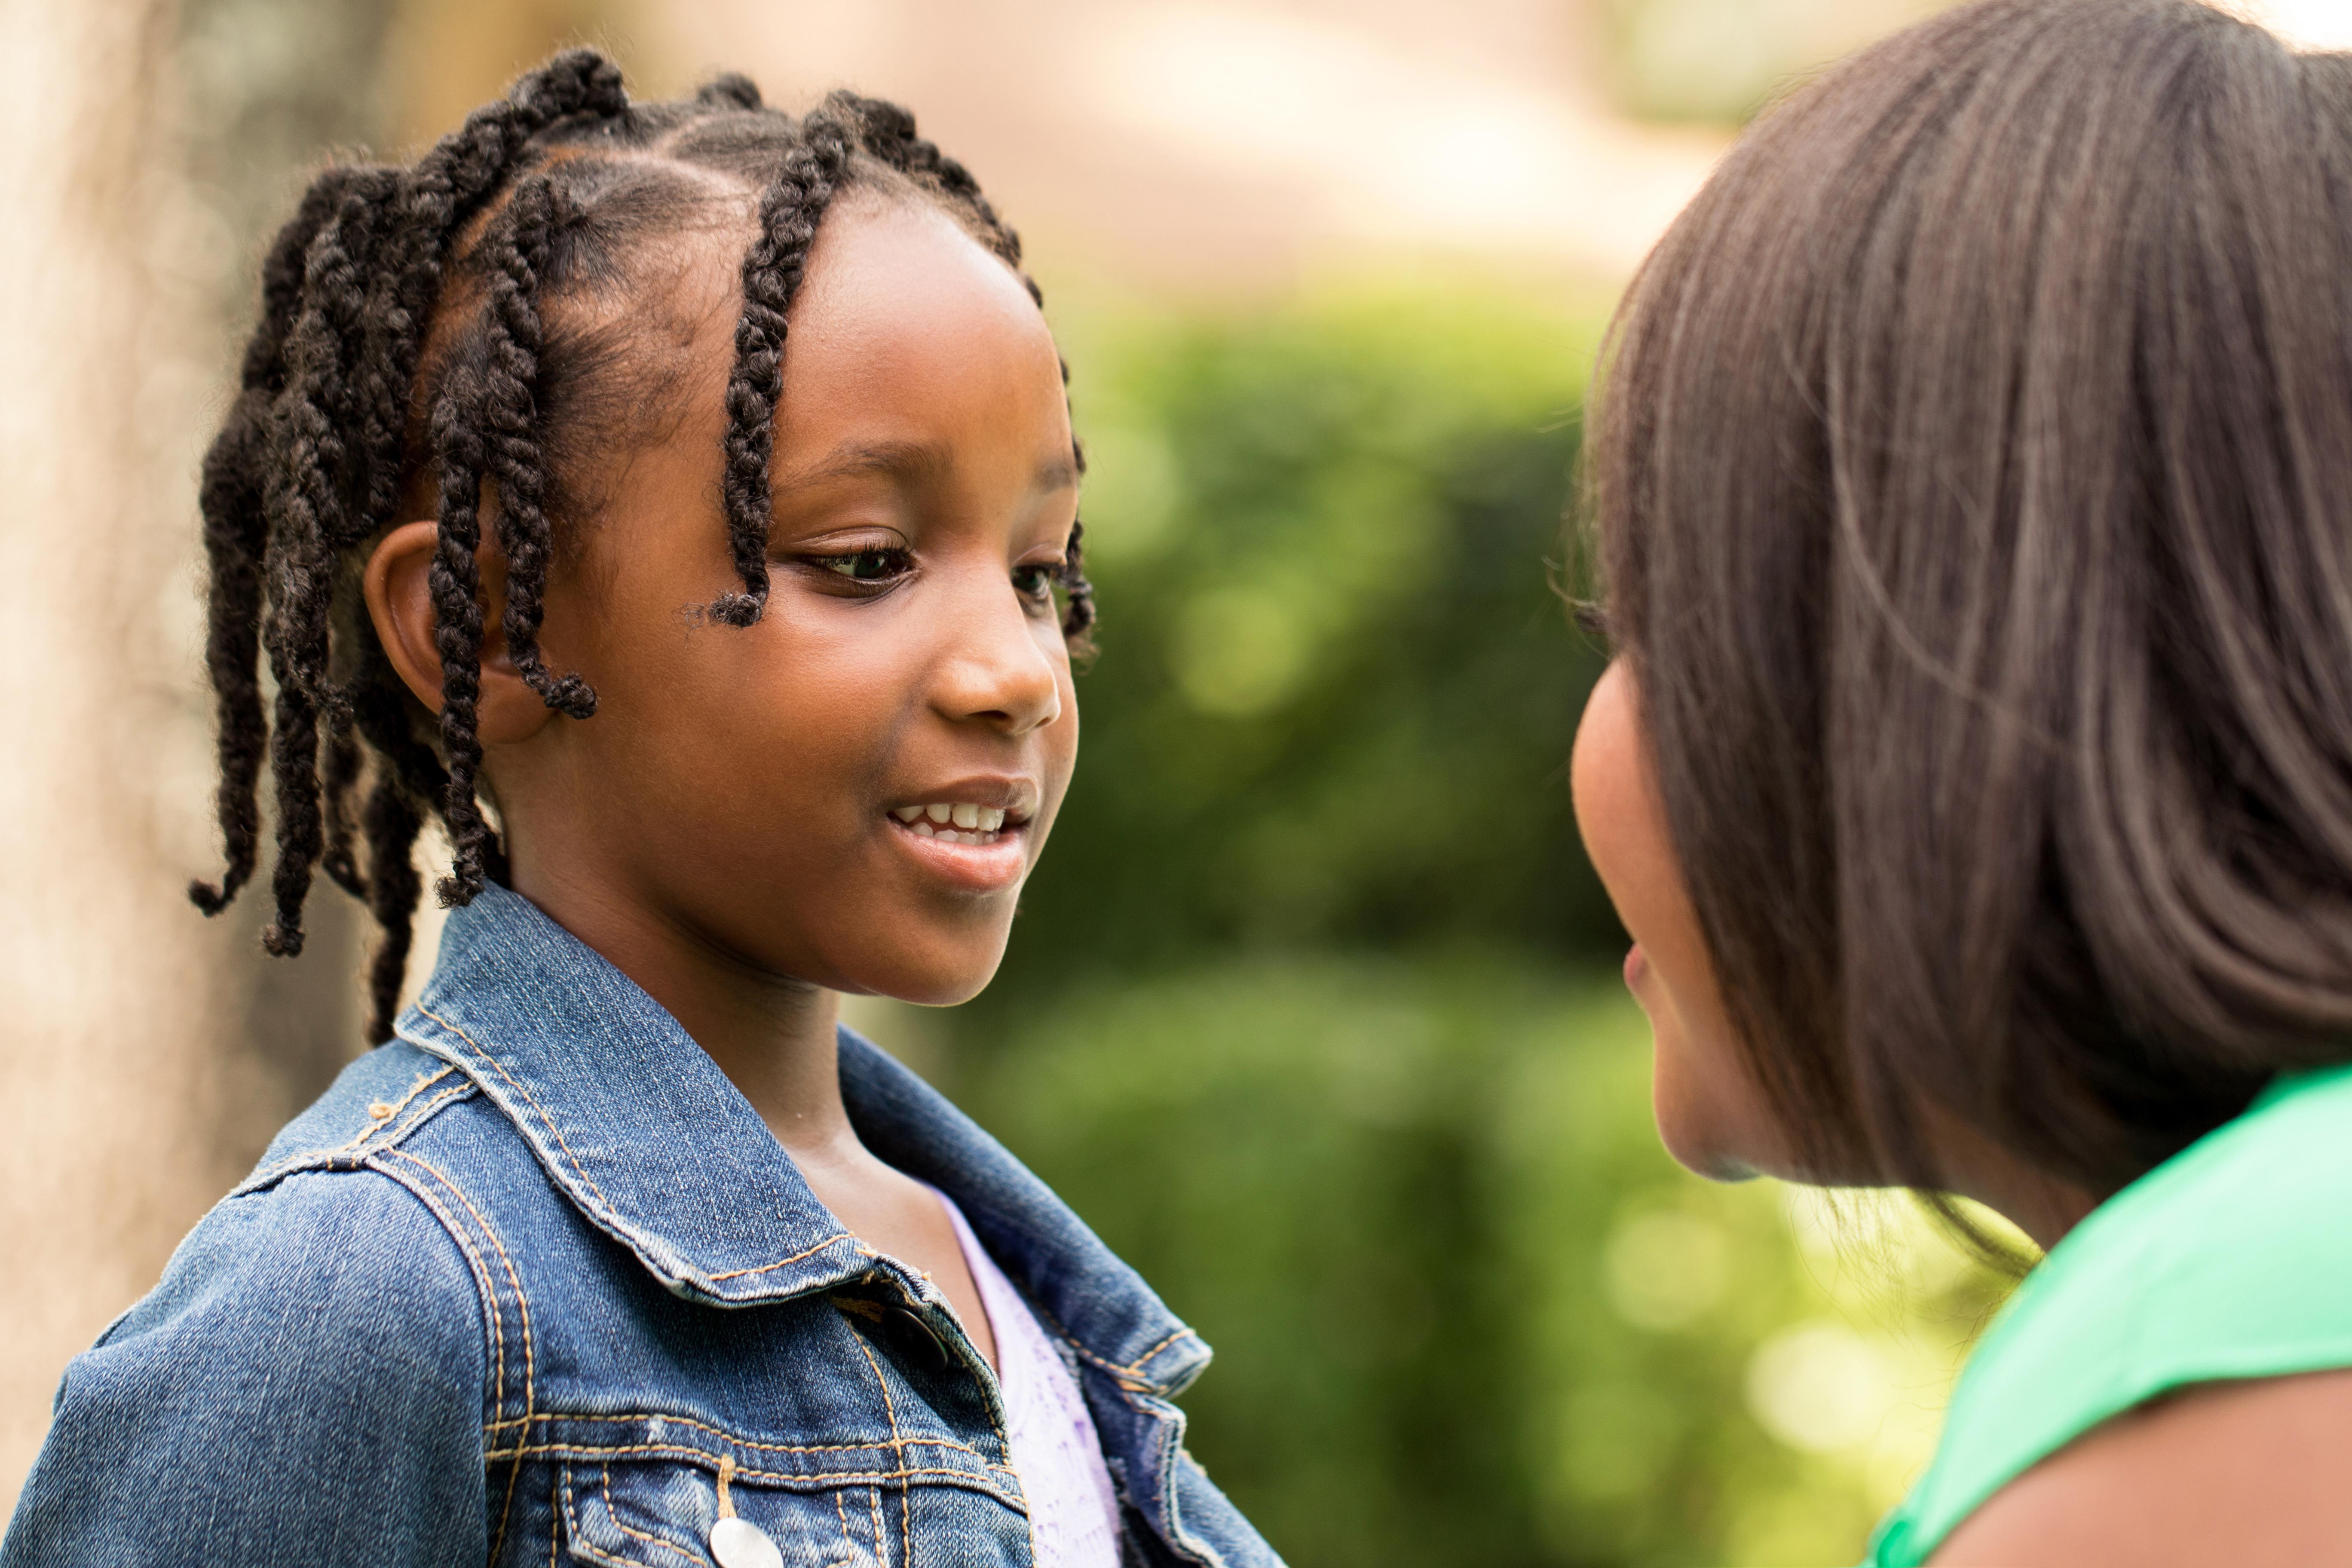 7 Year Old- Negative Thinking, Complaining, Arguing